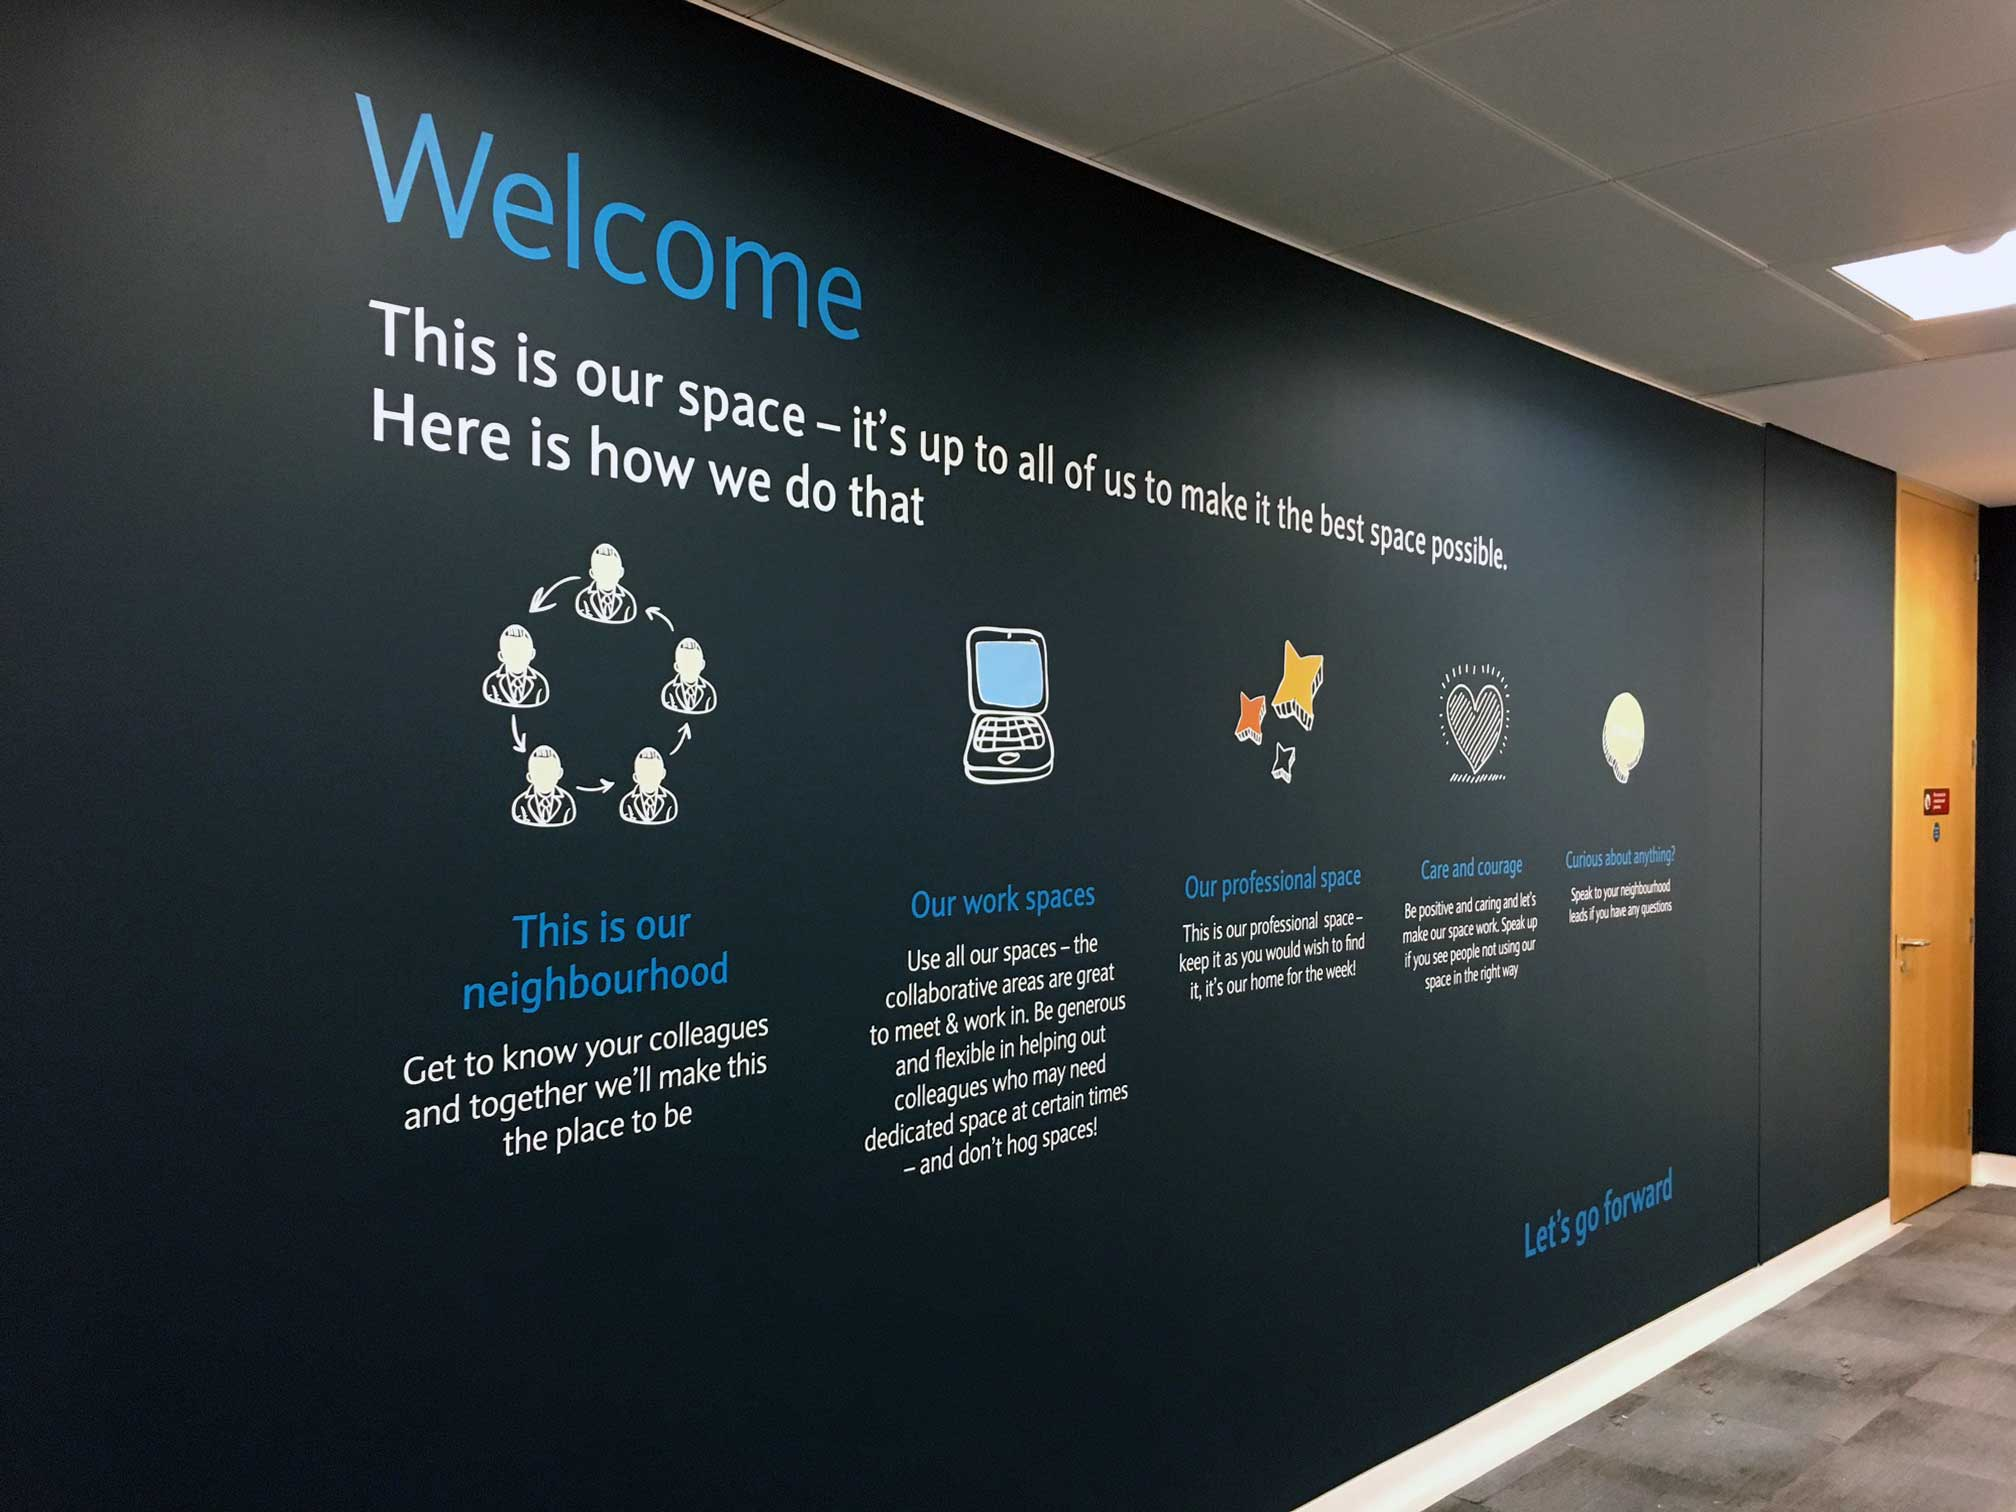 Barclays-wall-pre-space.jpg